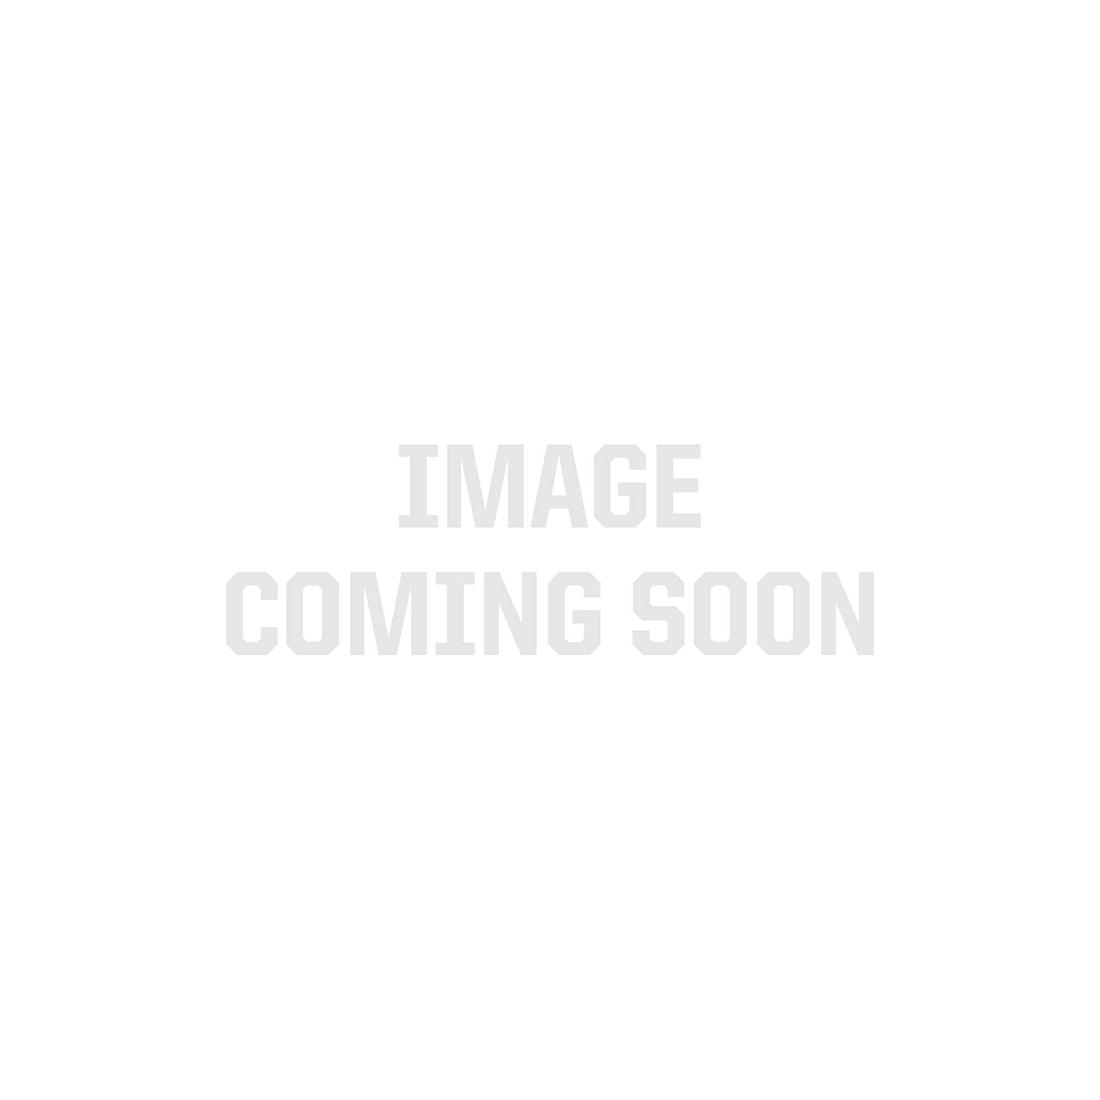 LumenMax 2835 LED Strip Light - 4,000K - 240/m - CurrentControl - Sample Kit